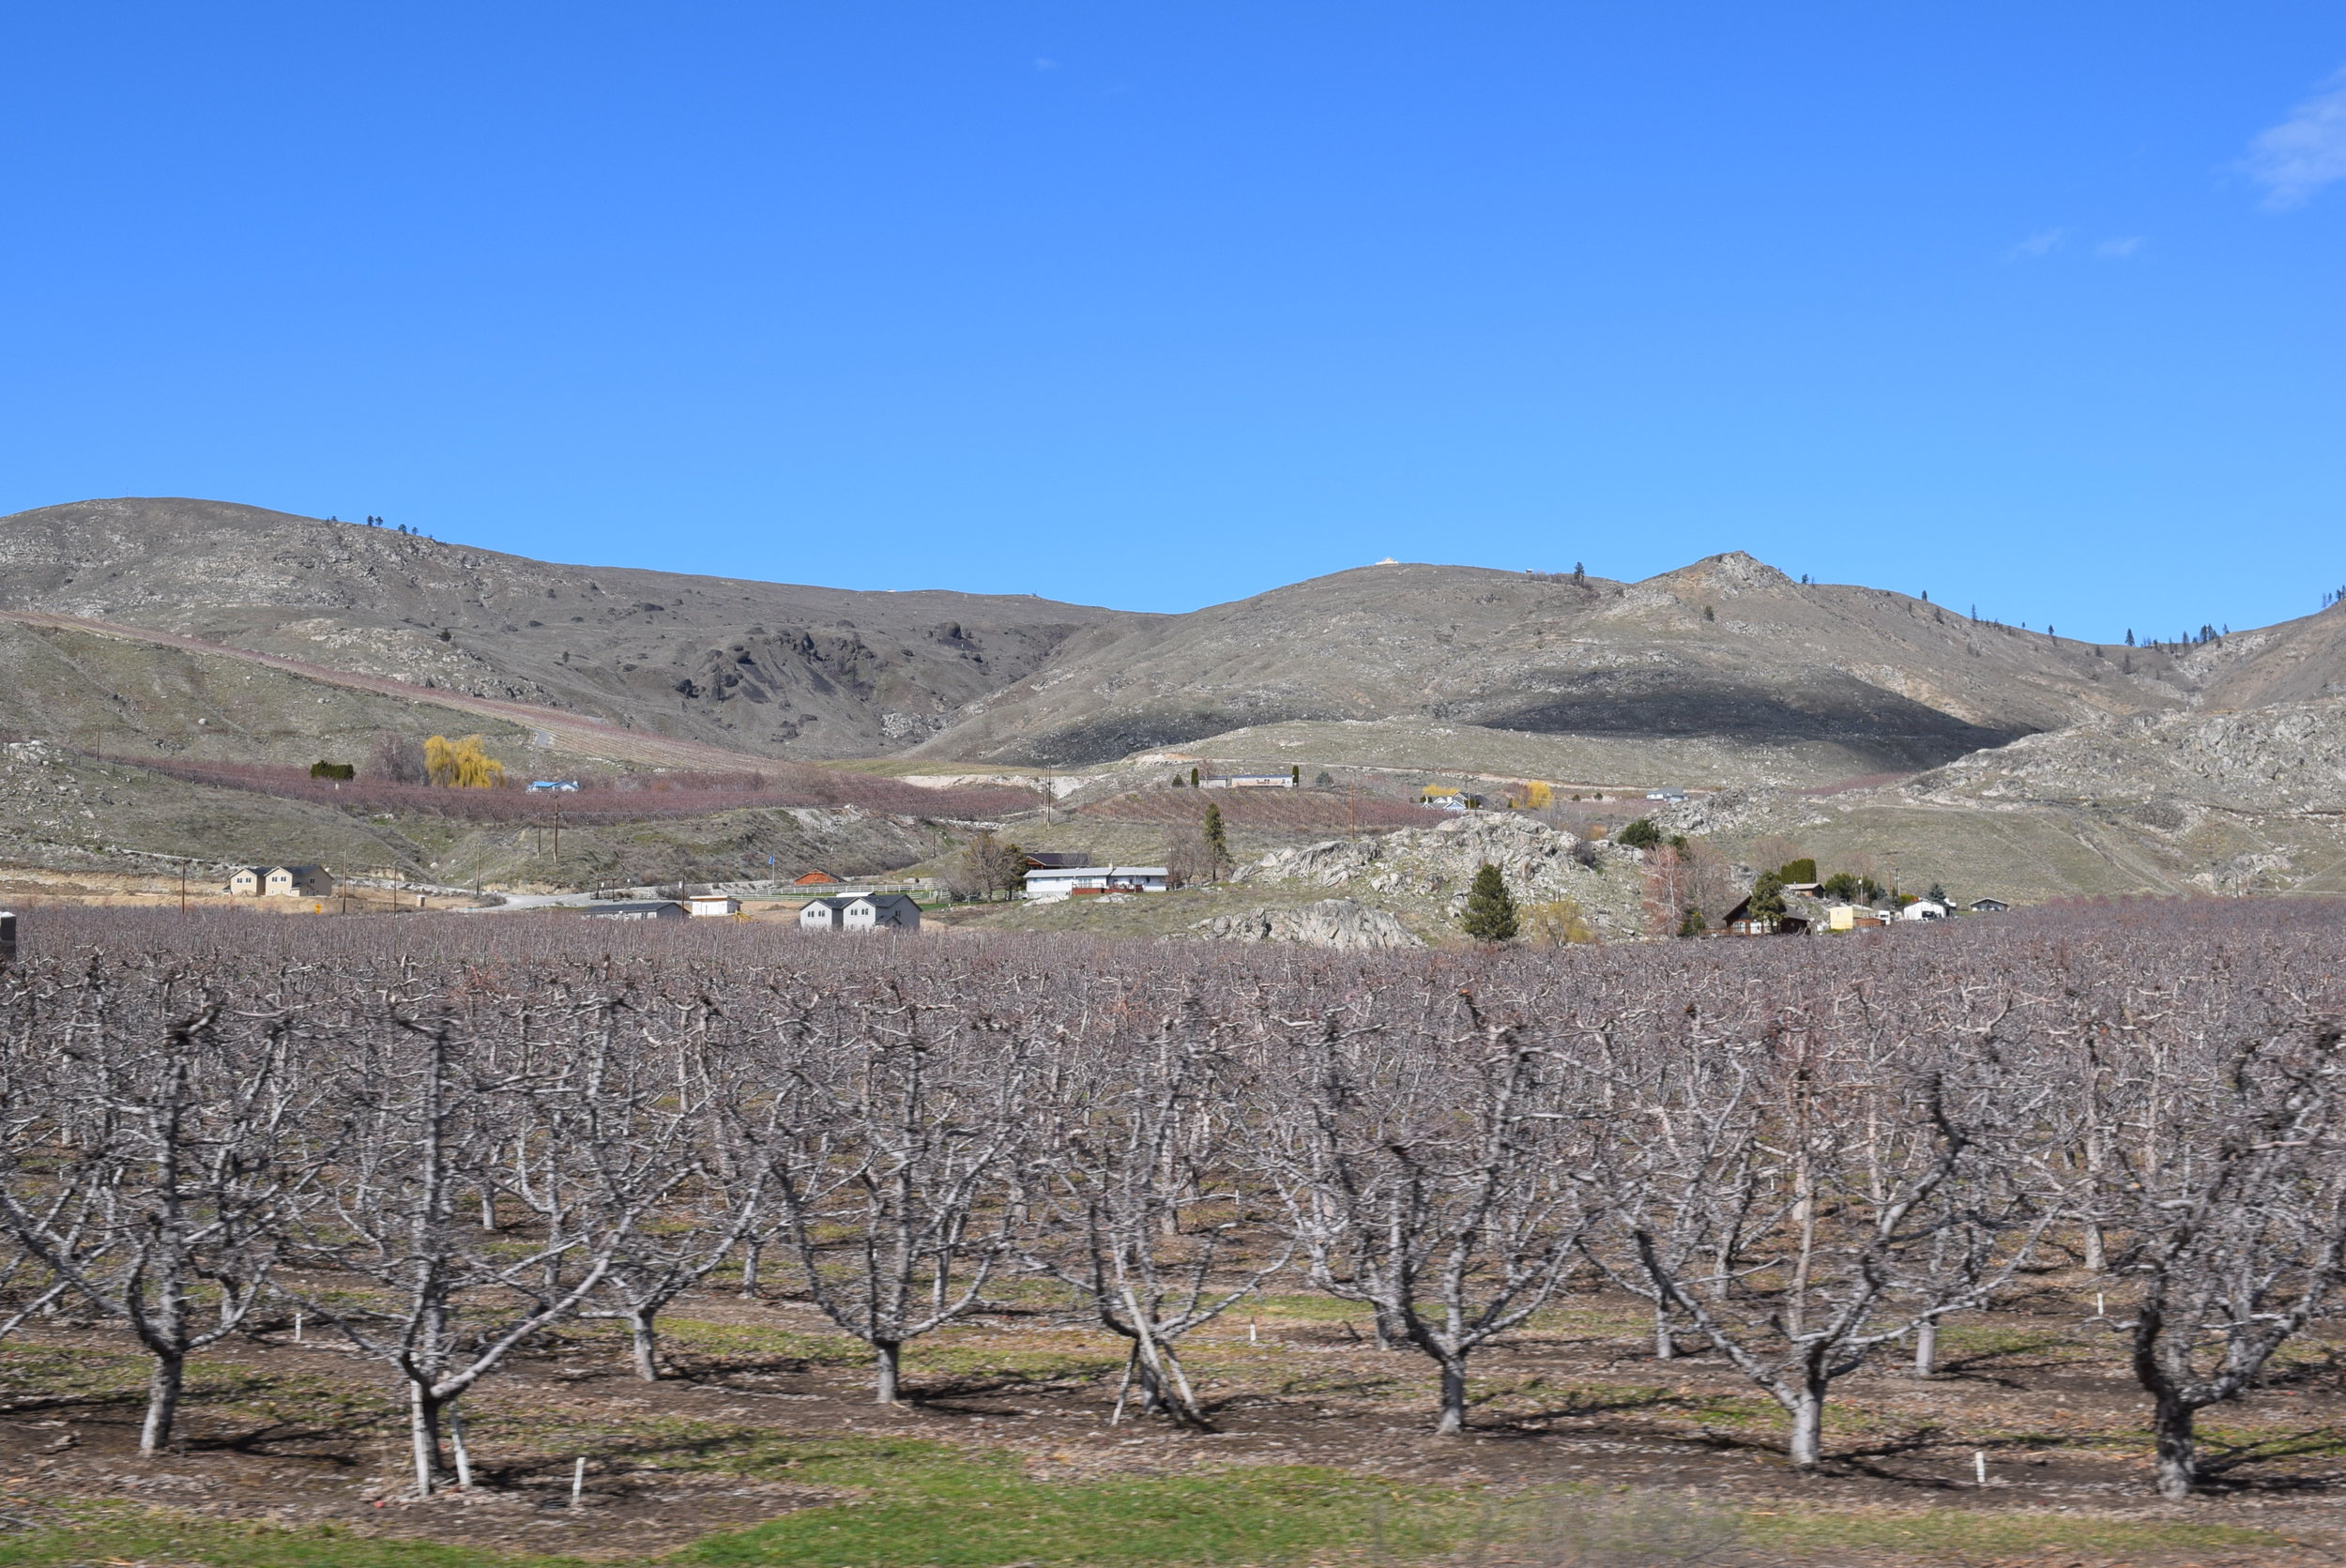 Vineyards in central Washington.